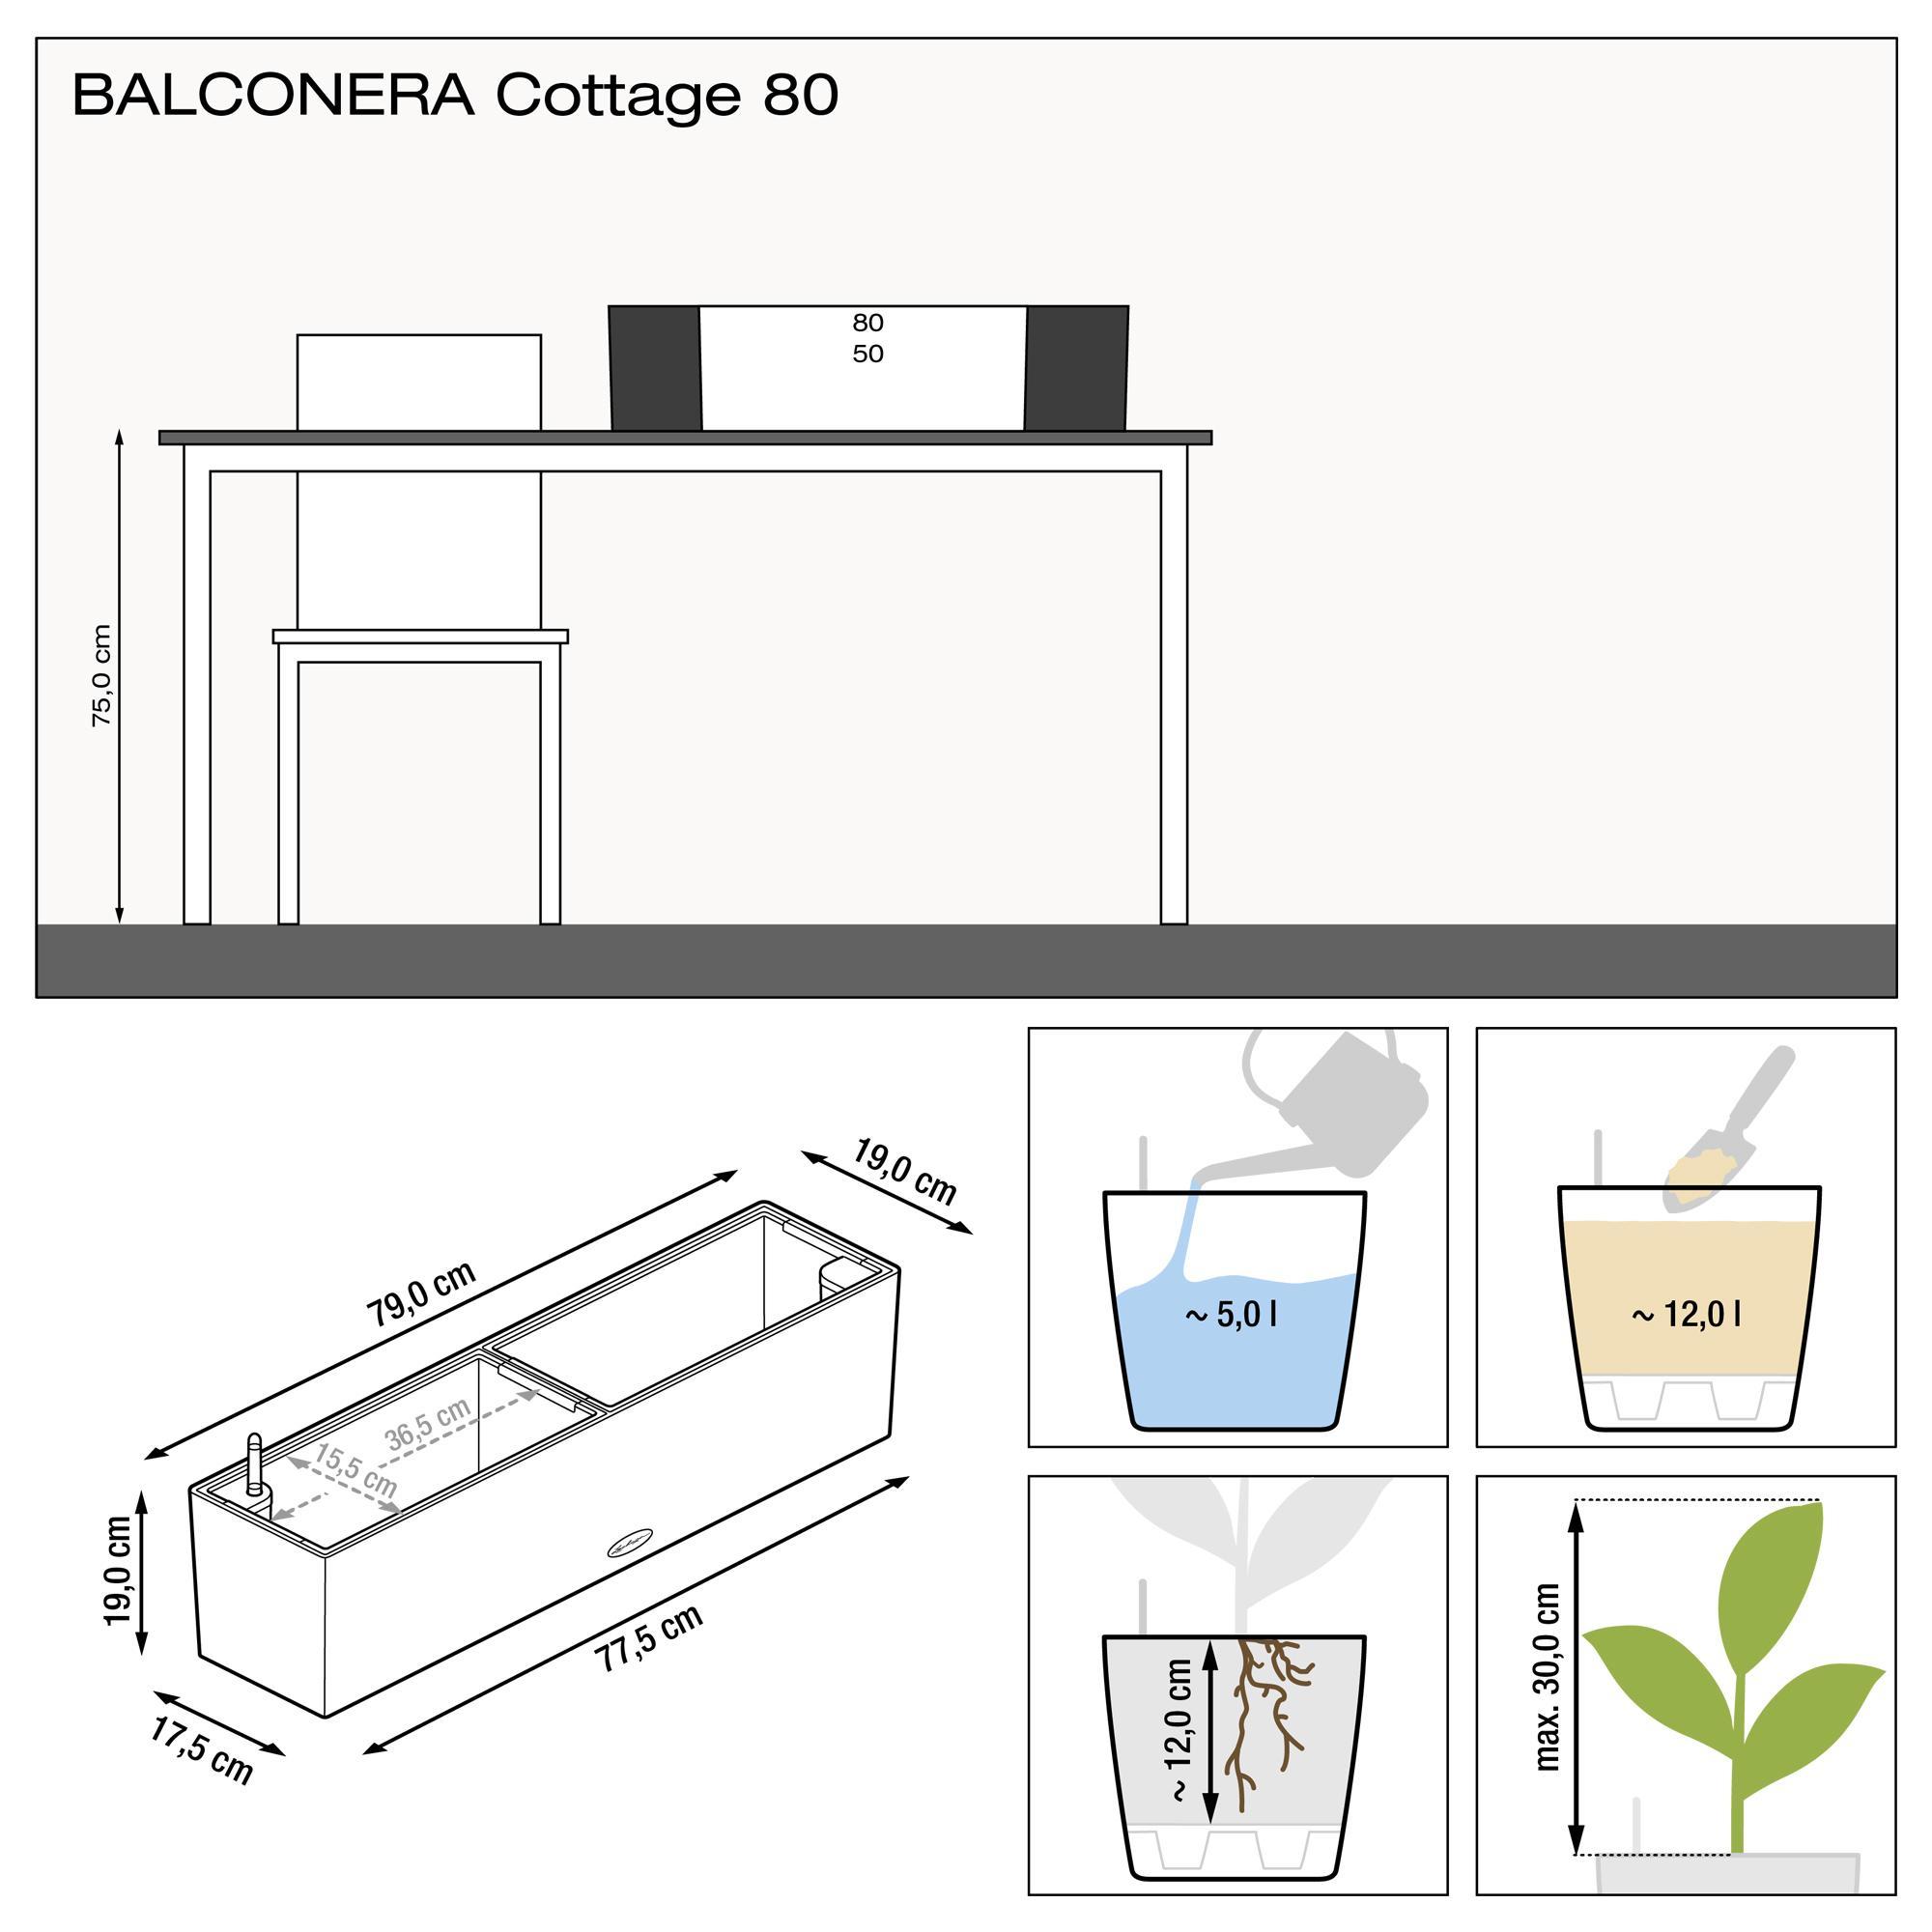 BALCONERA Cottage 80 granit - Bild 3